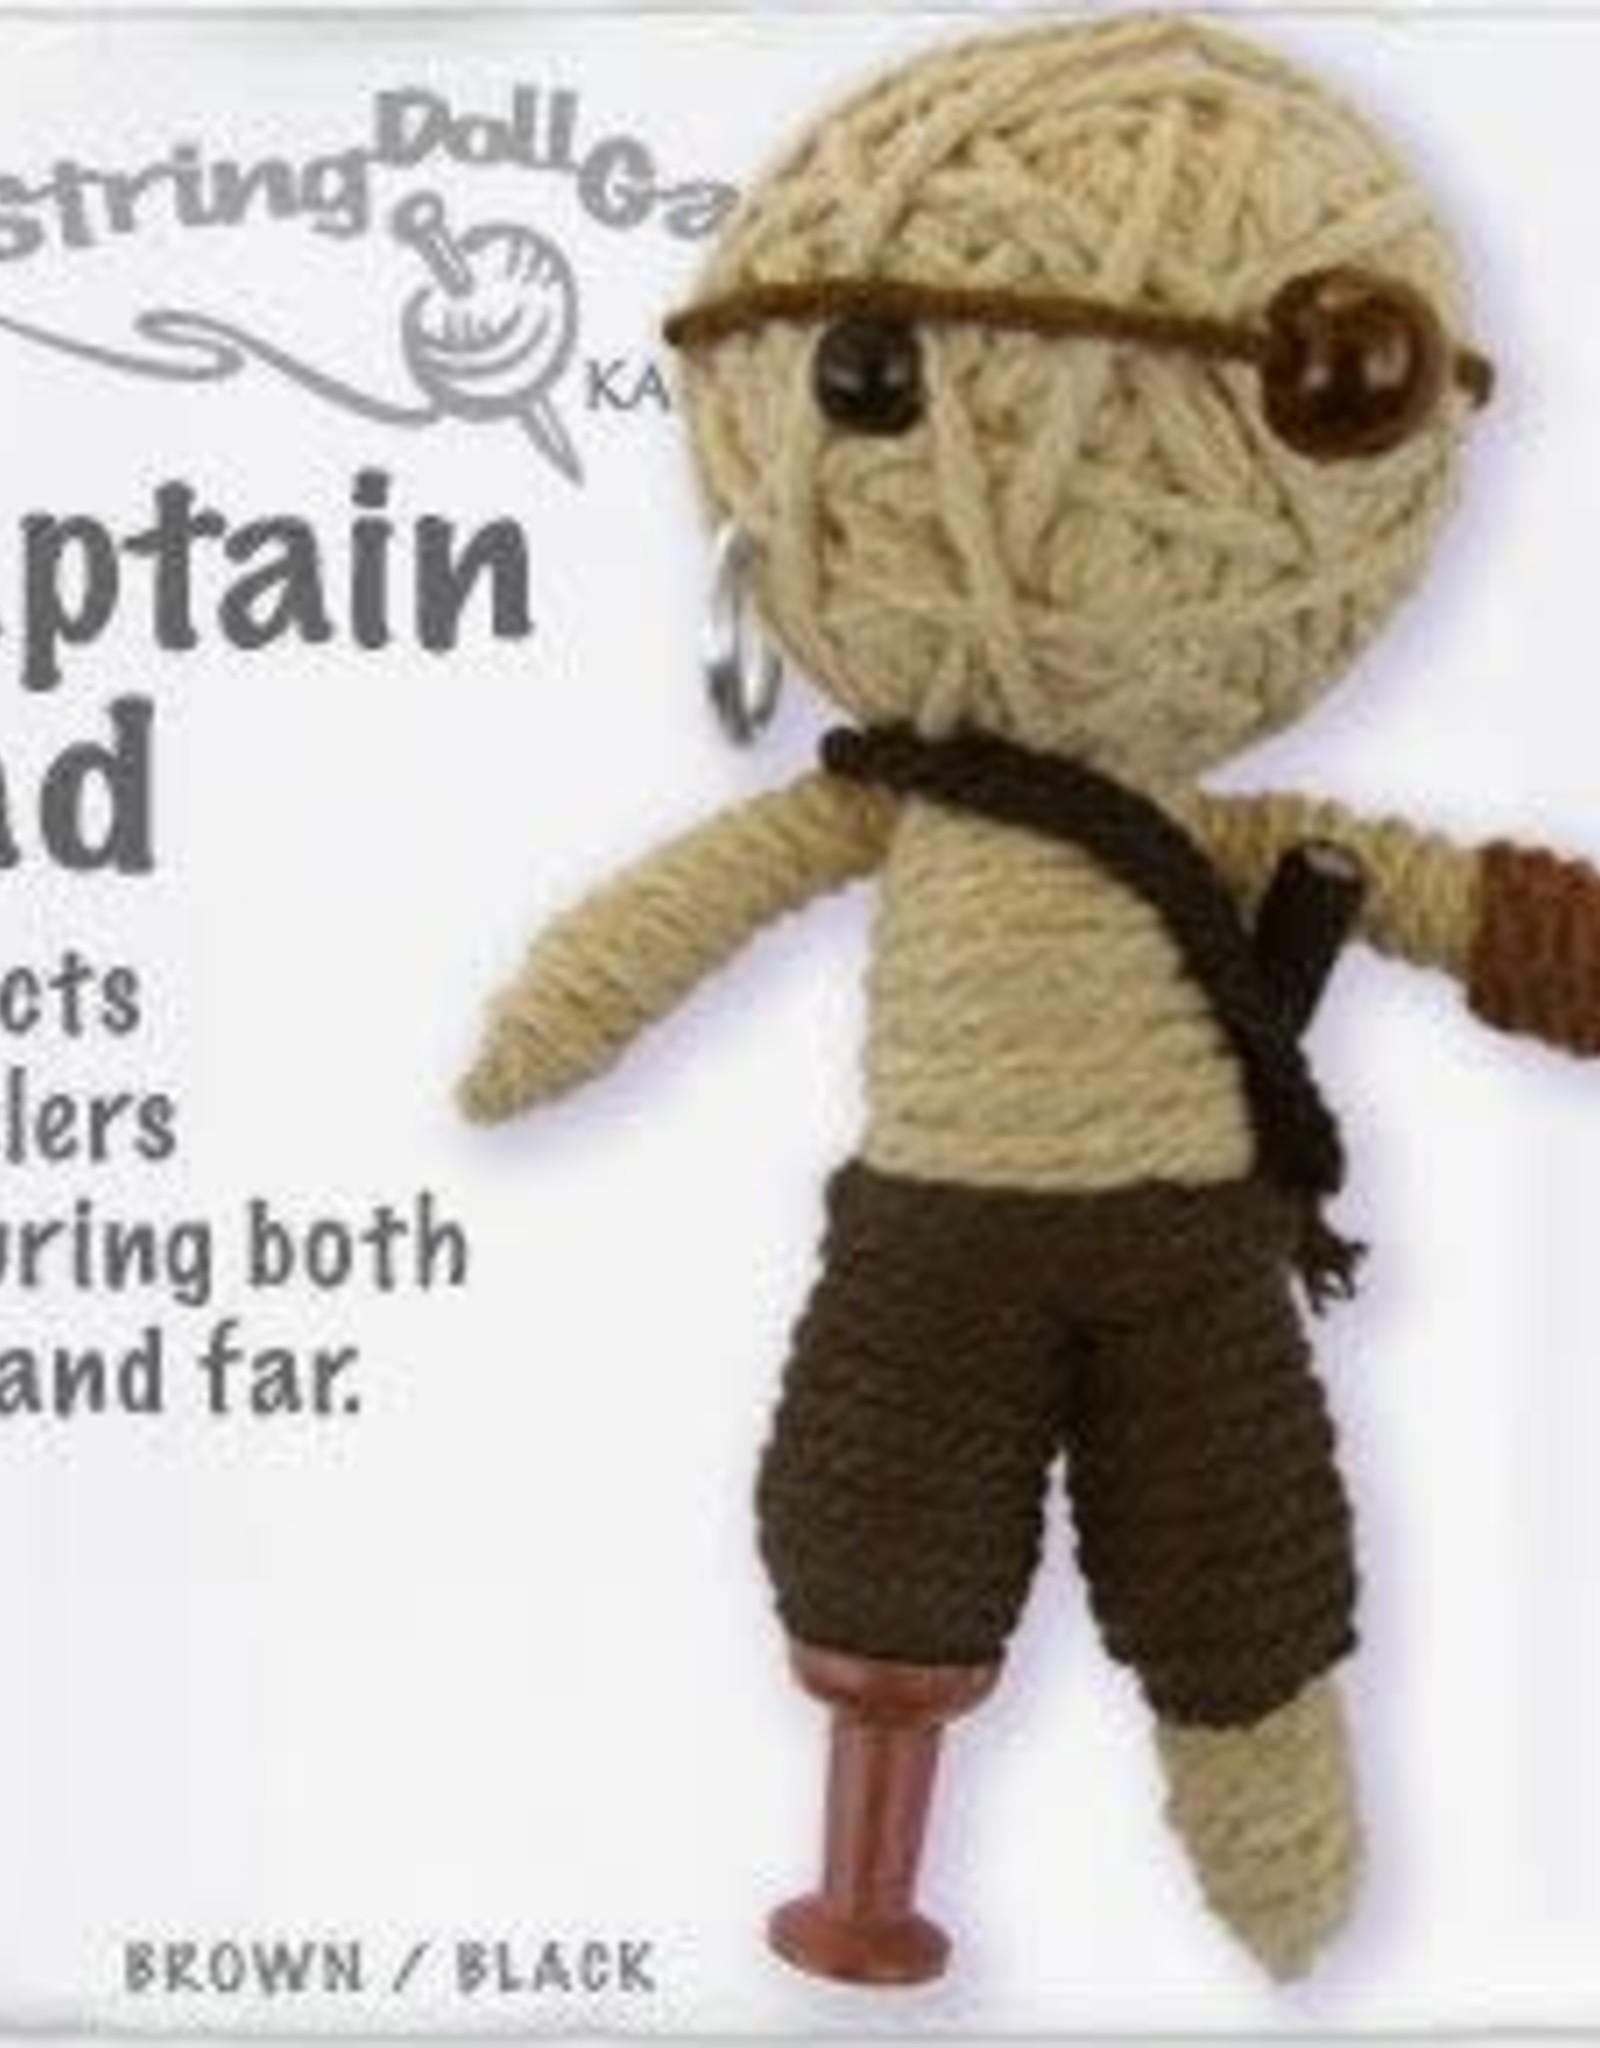 Captain Bad